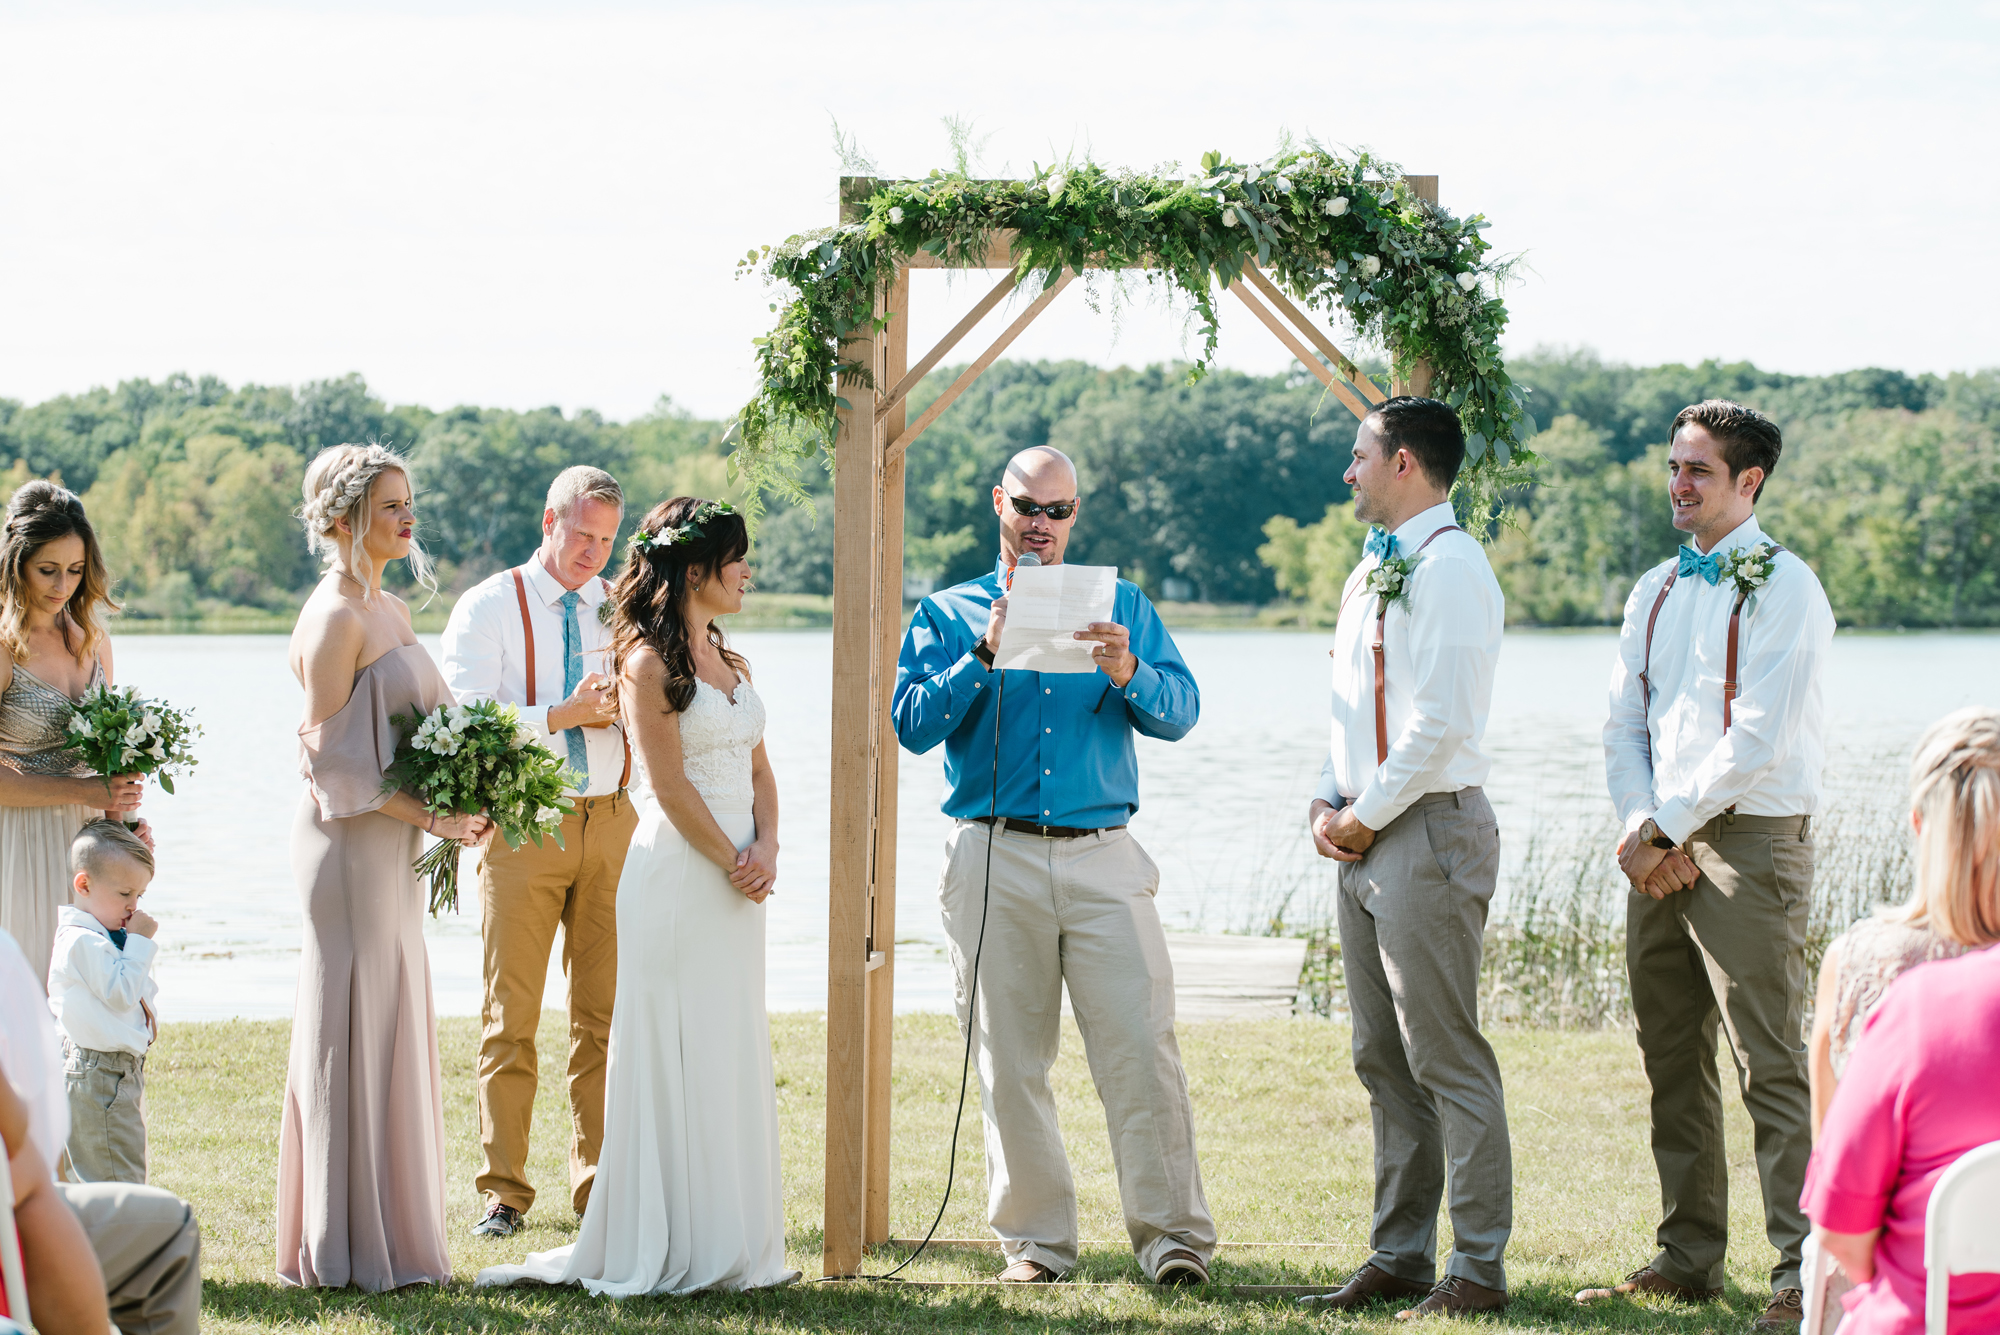 Quincy-Coldwater-Michigan-farm-wedding-photogapher-sydney-marie (120).jpg